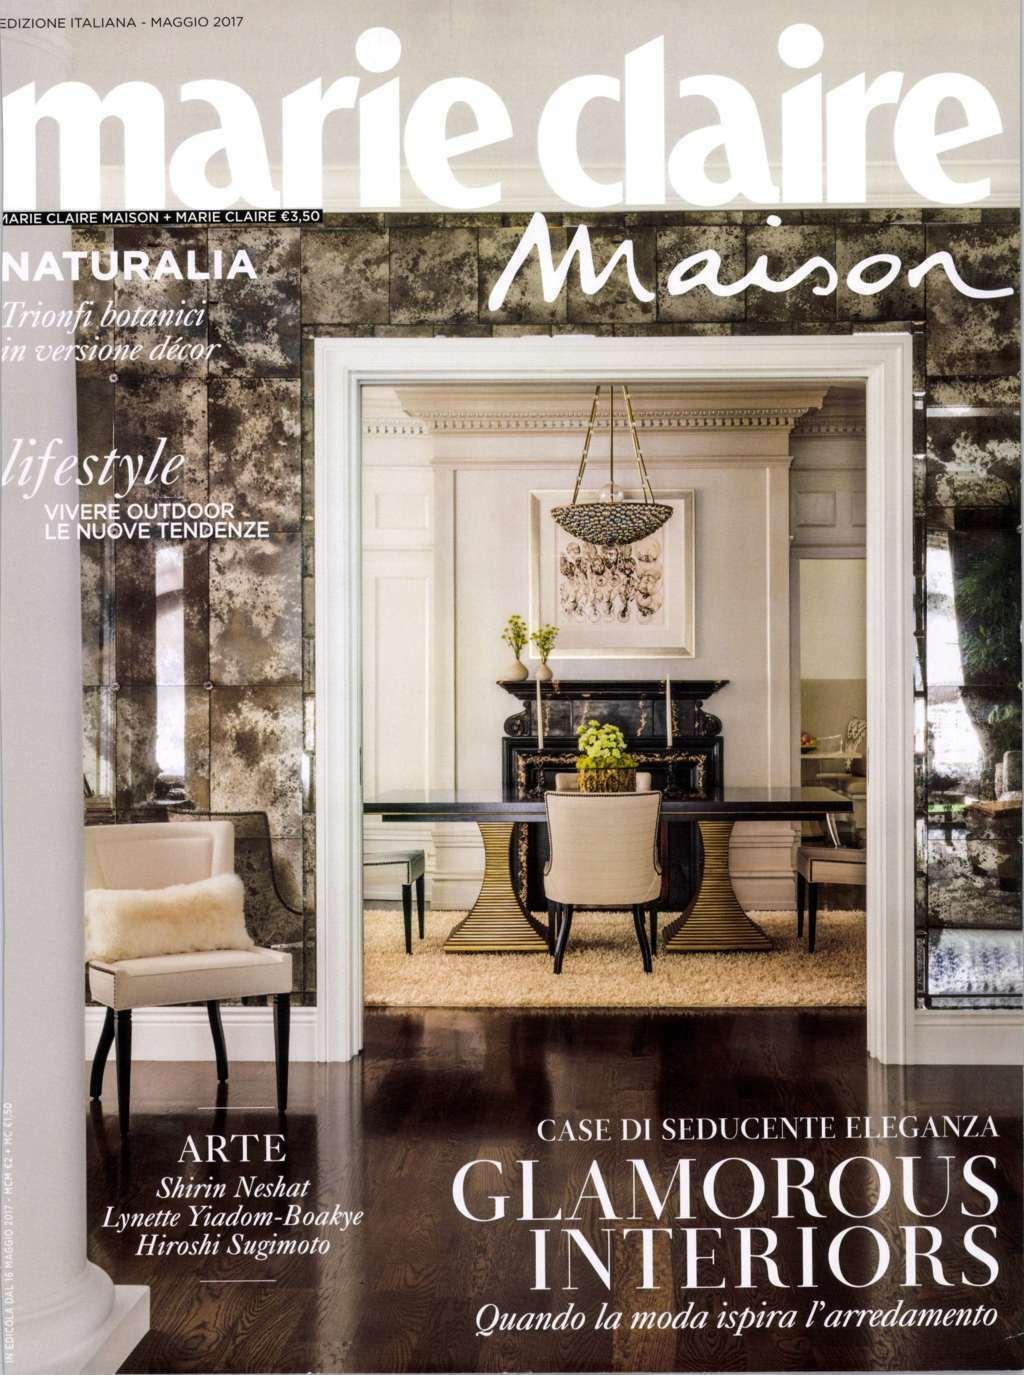 Gebr der thonet vienna heritage designs the future - Marie claire maison concours ...